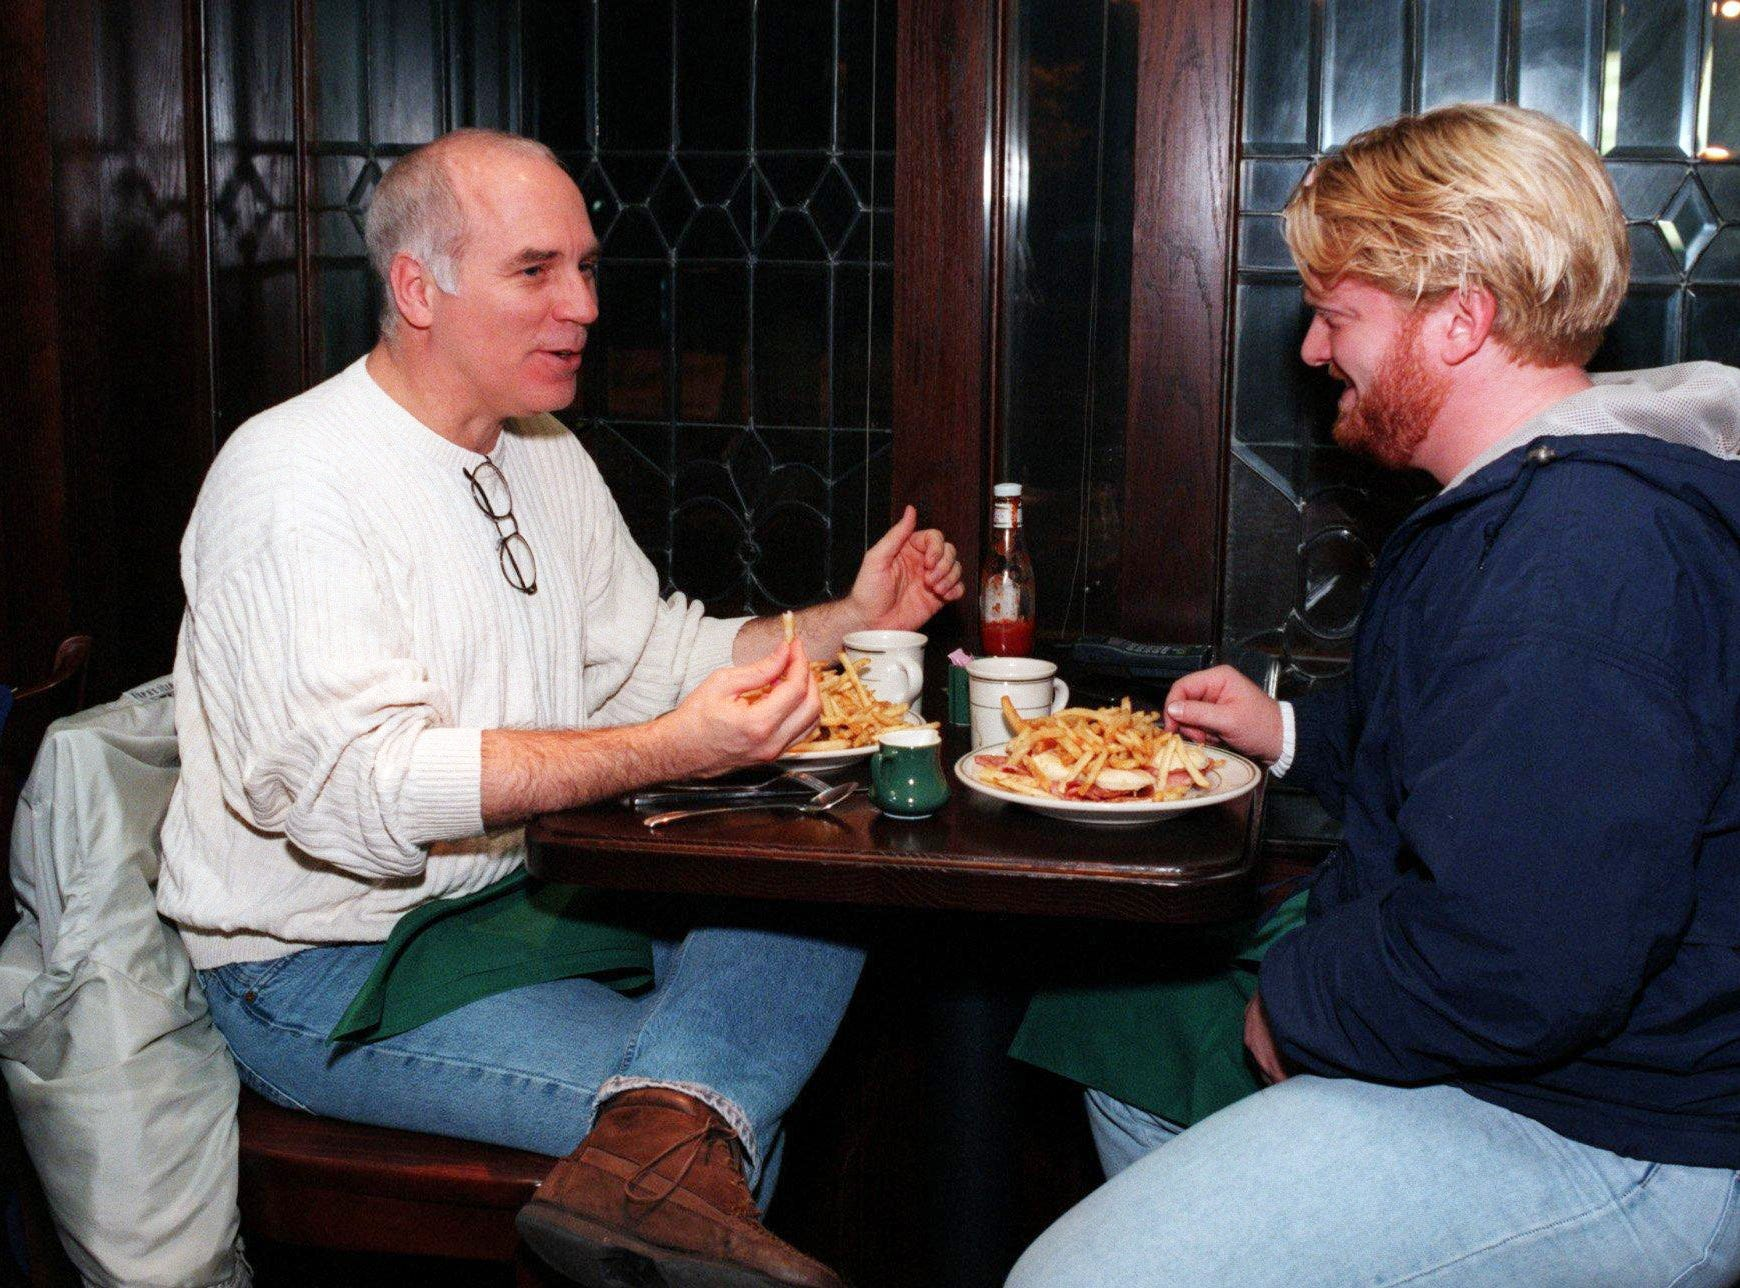 Danny Proctor, left, and Daryl Pike eat dinner at Ireland's restaurant Nov. 23, 1997.